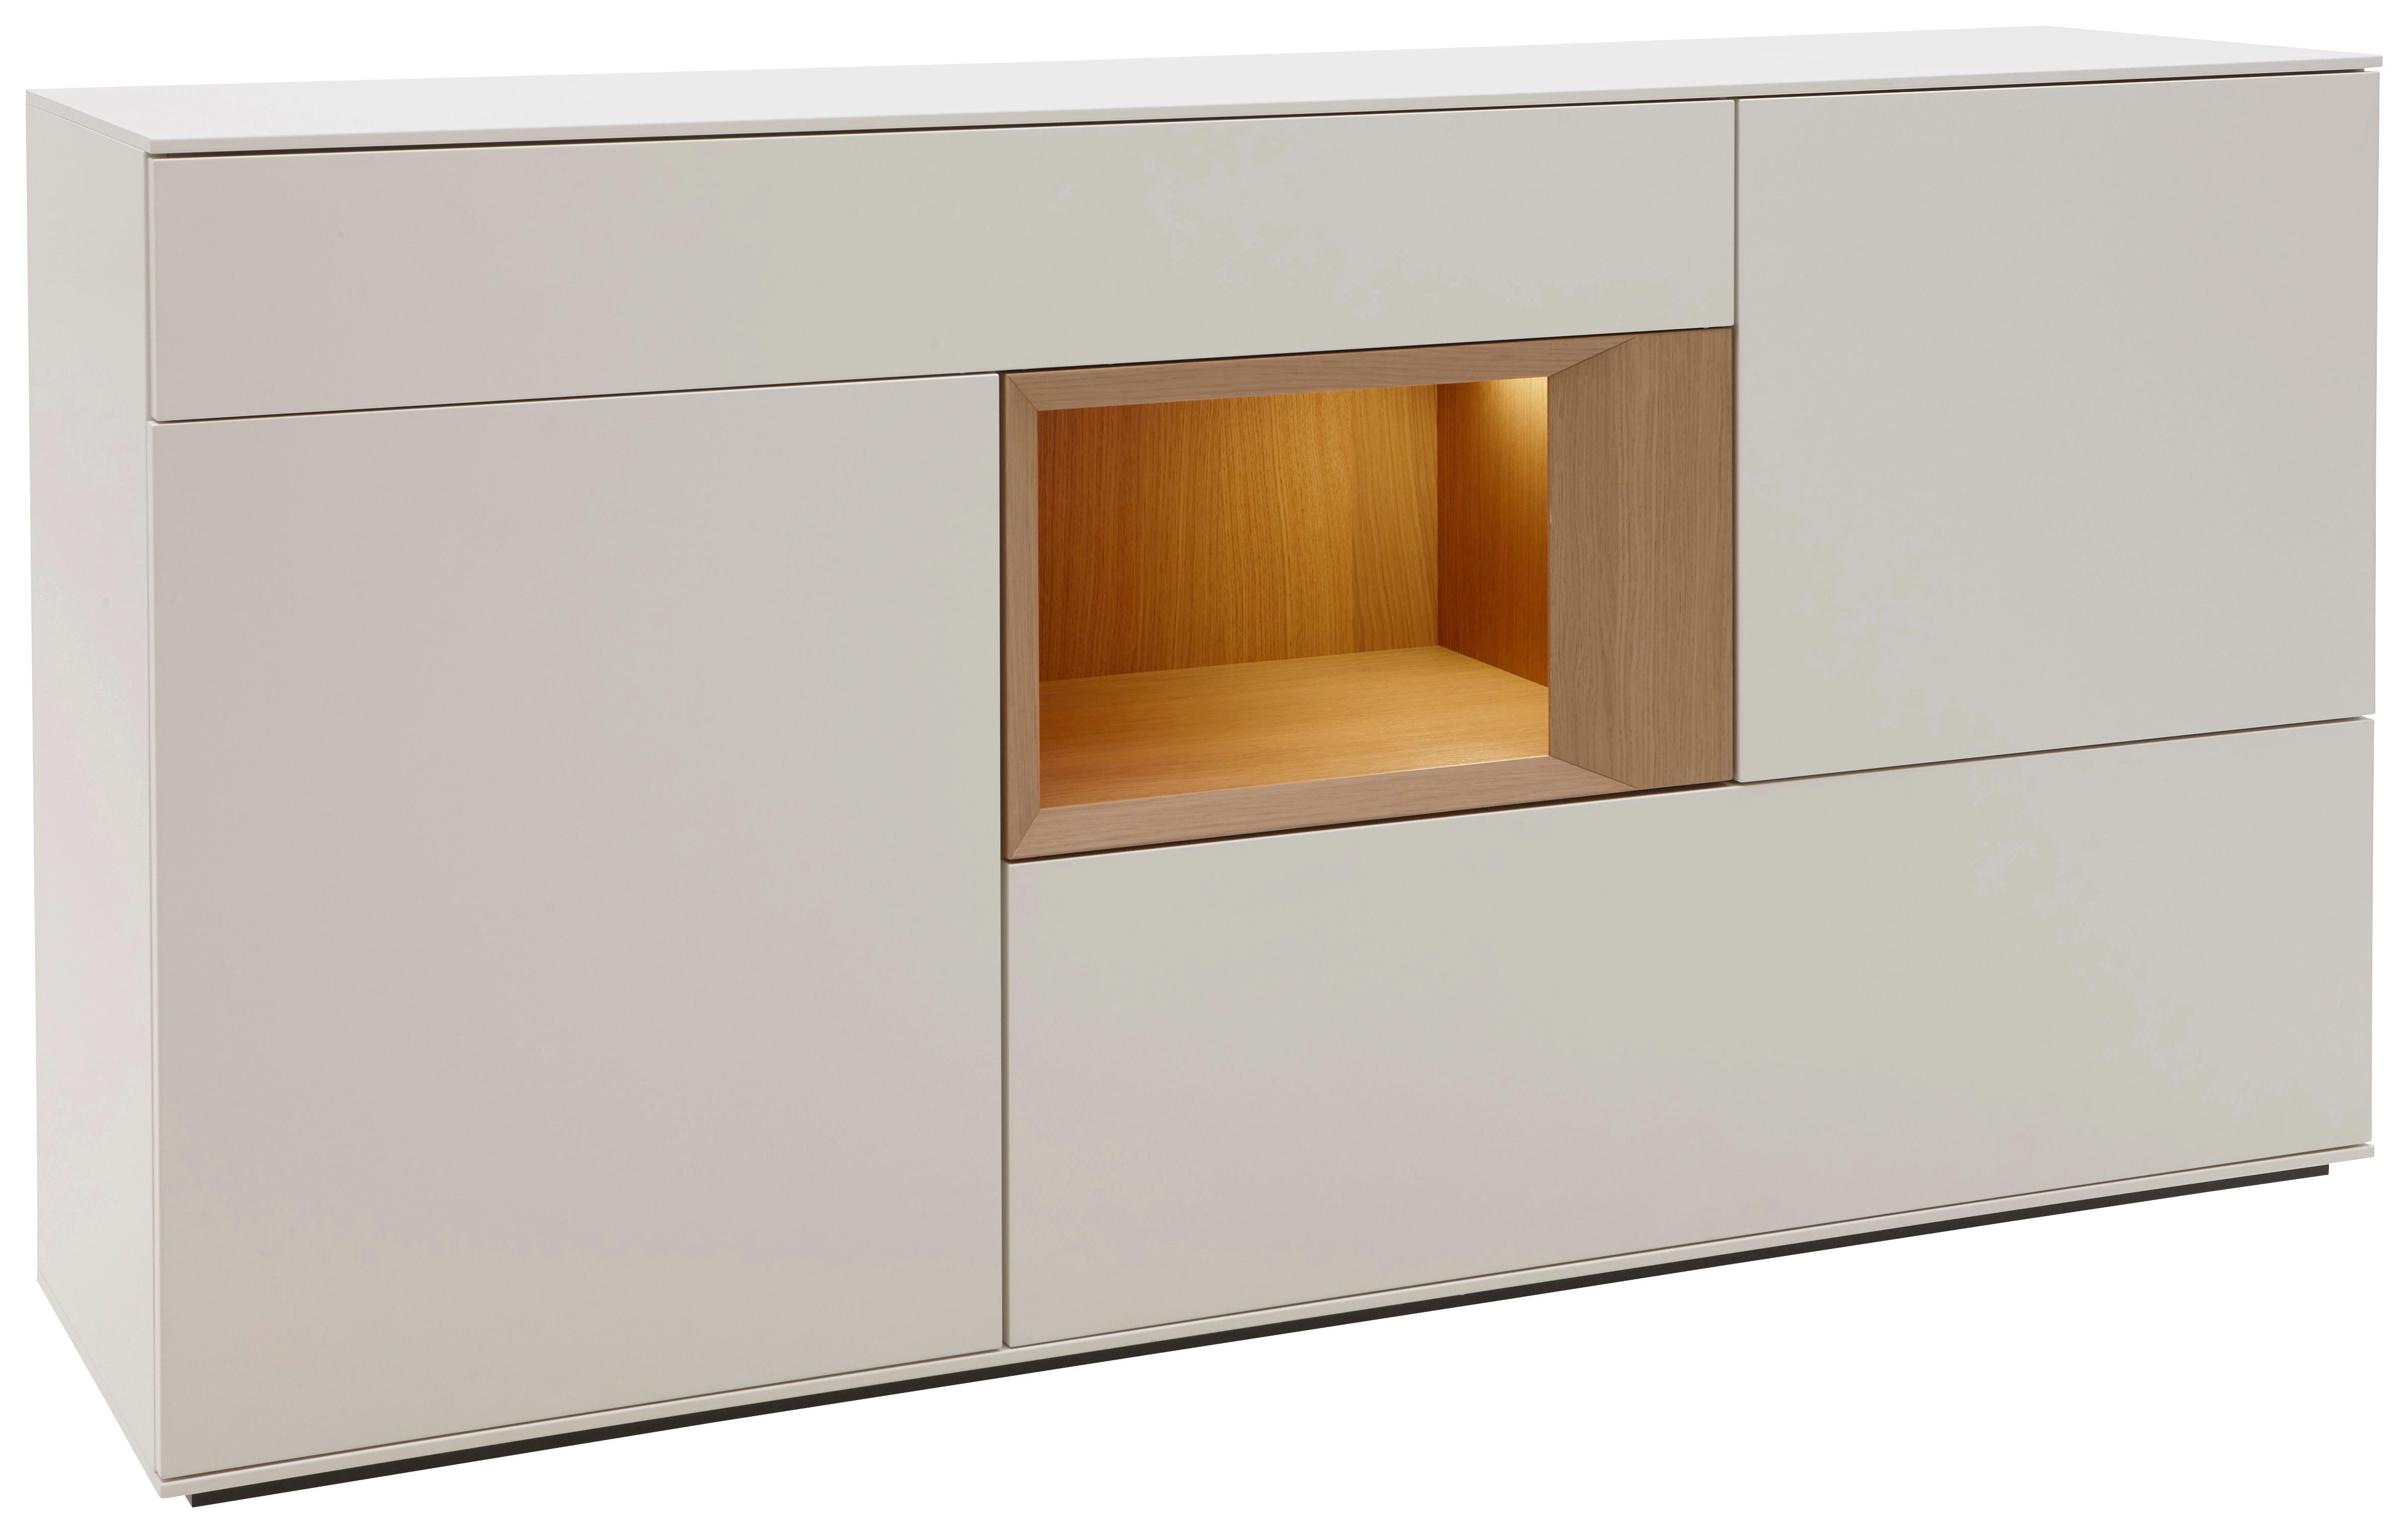 Sideboard Design Holz Best With Sideboard Design Holz Cheap